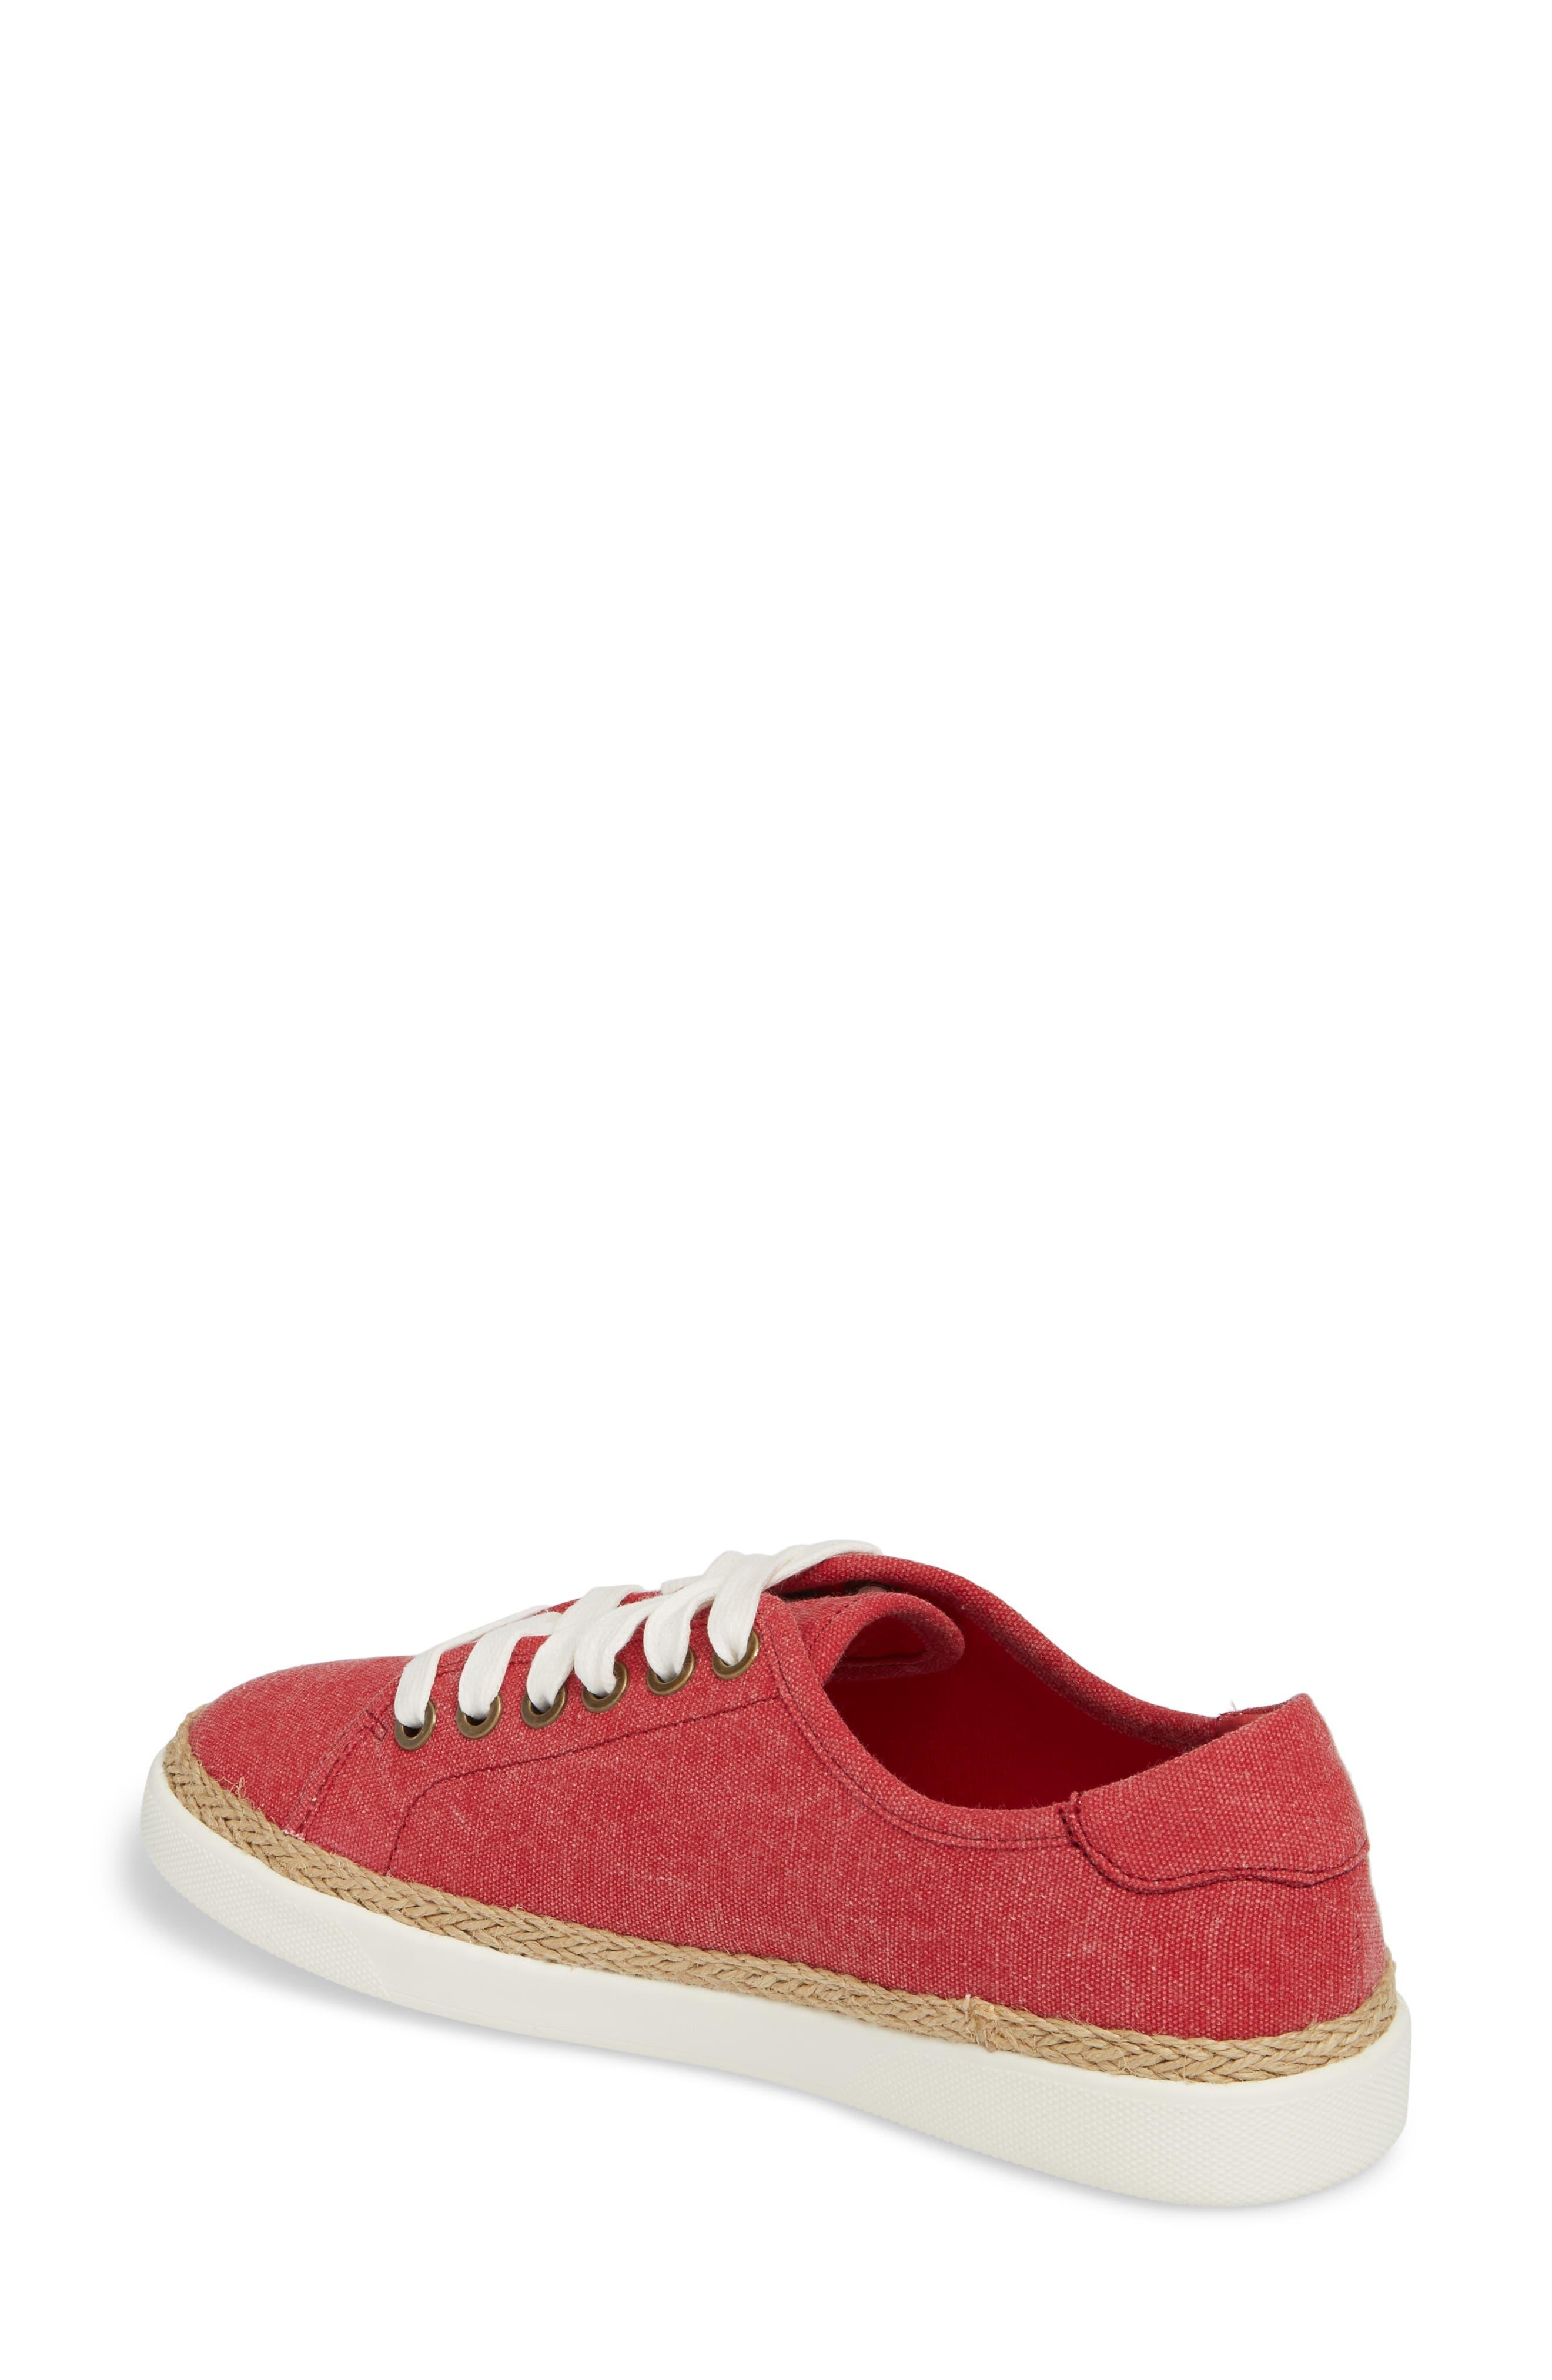 Hattie Sneaker,                             Alternate thumbnail 8, color,